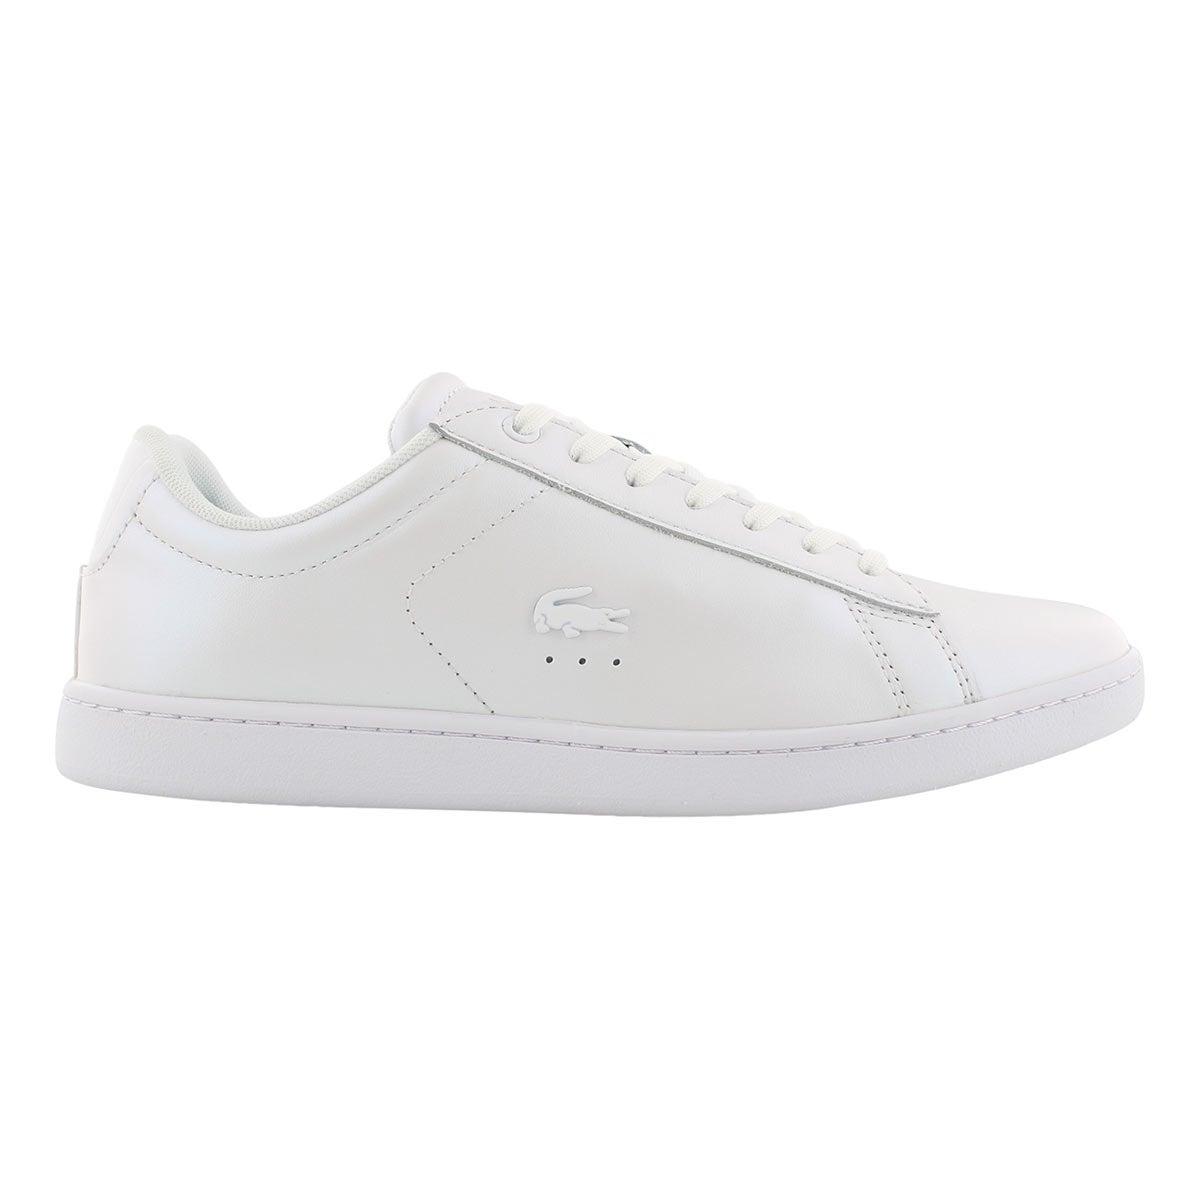 Lds CarnabyEVO318 wht/wht fashion sneakr